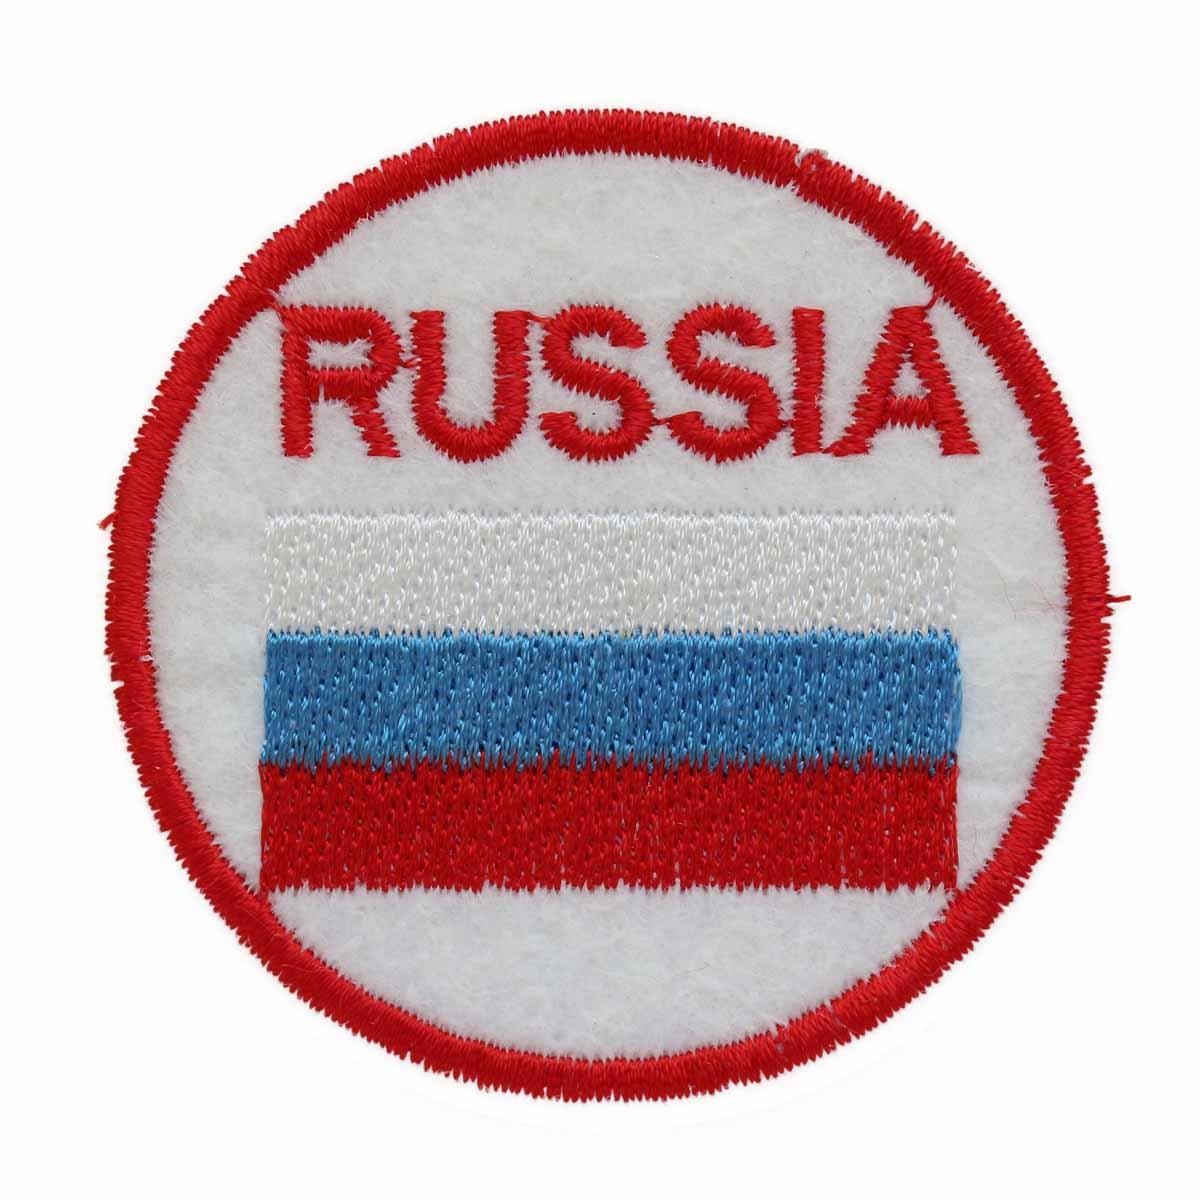 Термоаппликация LM-80374 'Russia' 1шт Hobby&Pro basic